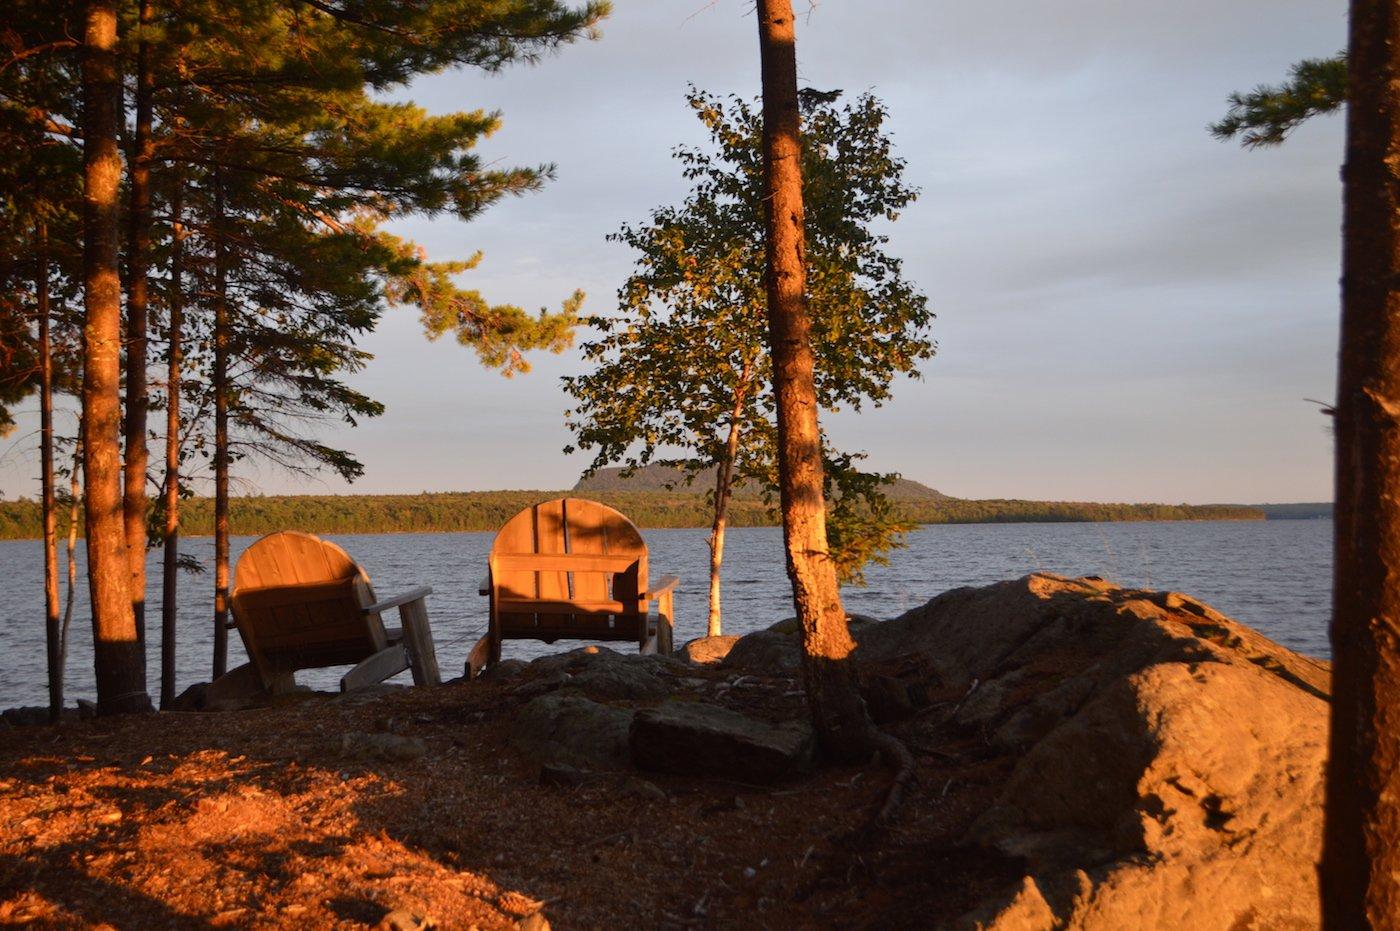 Lakeside retreat, Tomhegan Cabins